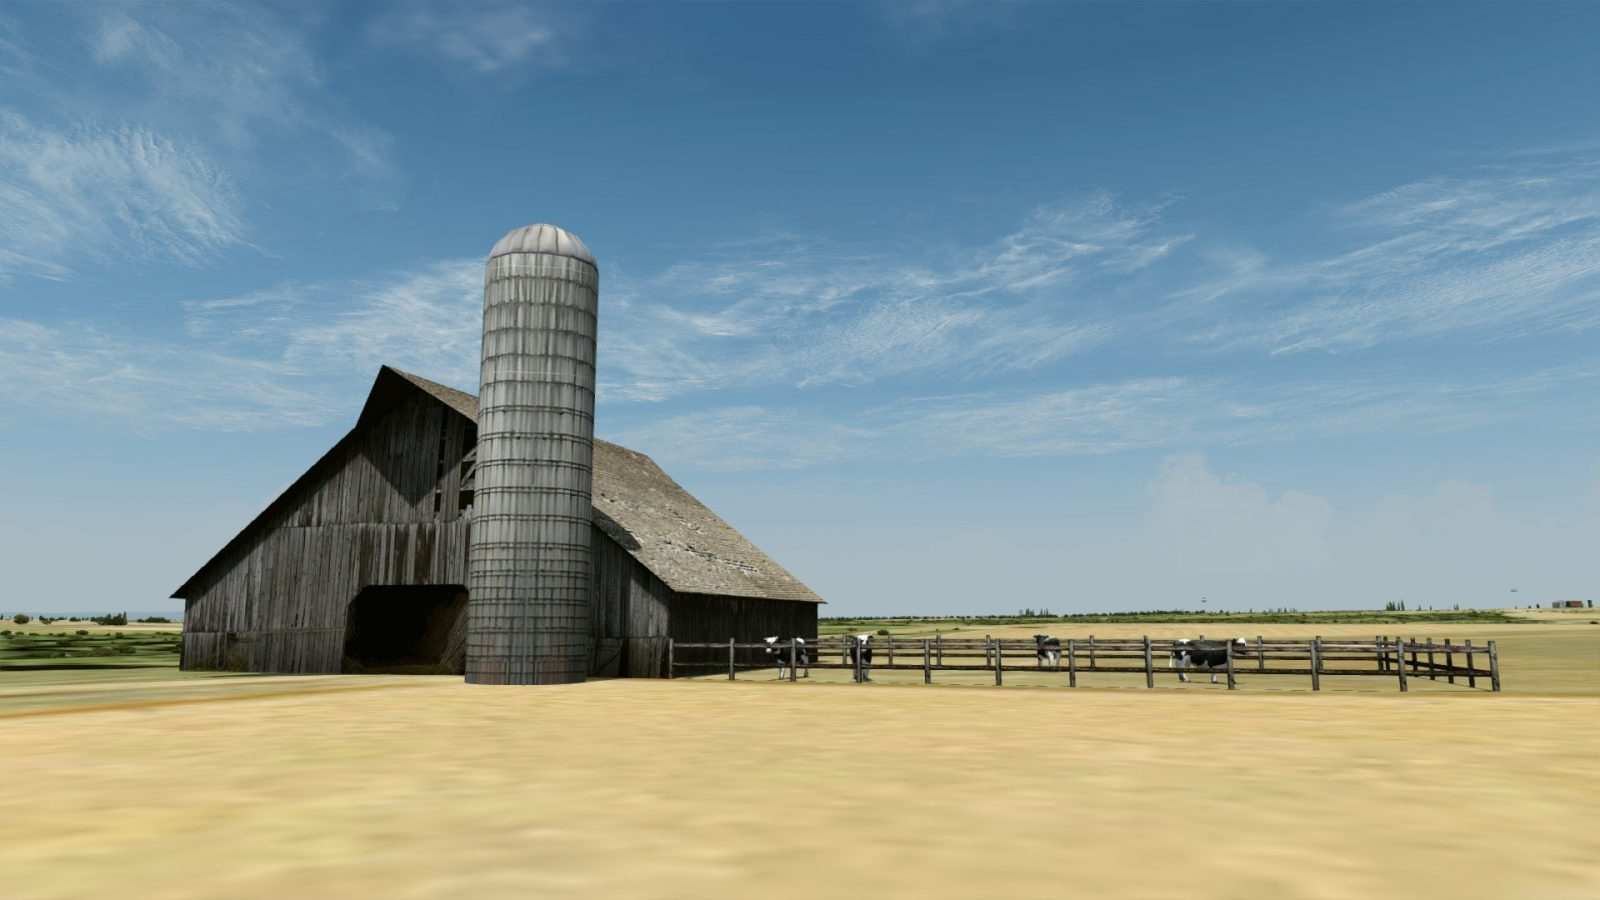 orbx-buildings-hd-previews-19-1600x900.j